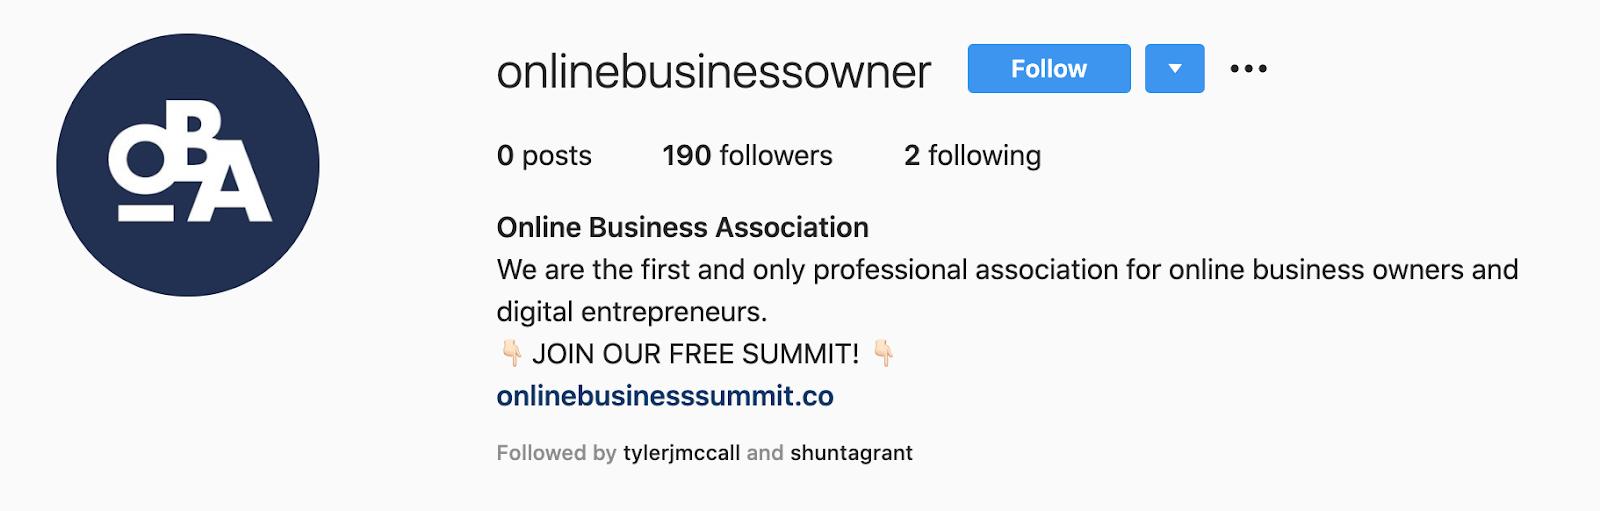 Write Perfectly Optimized Instagram Bio